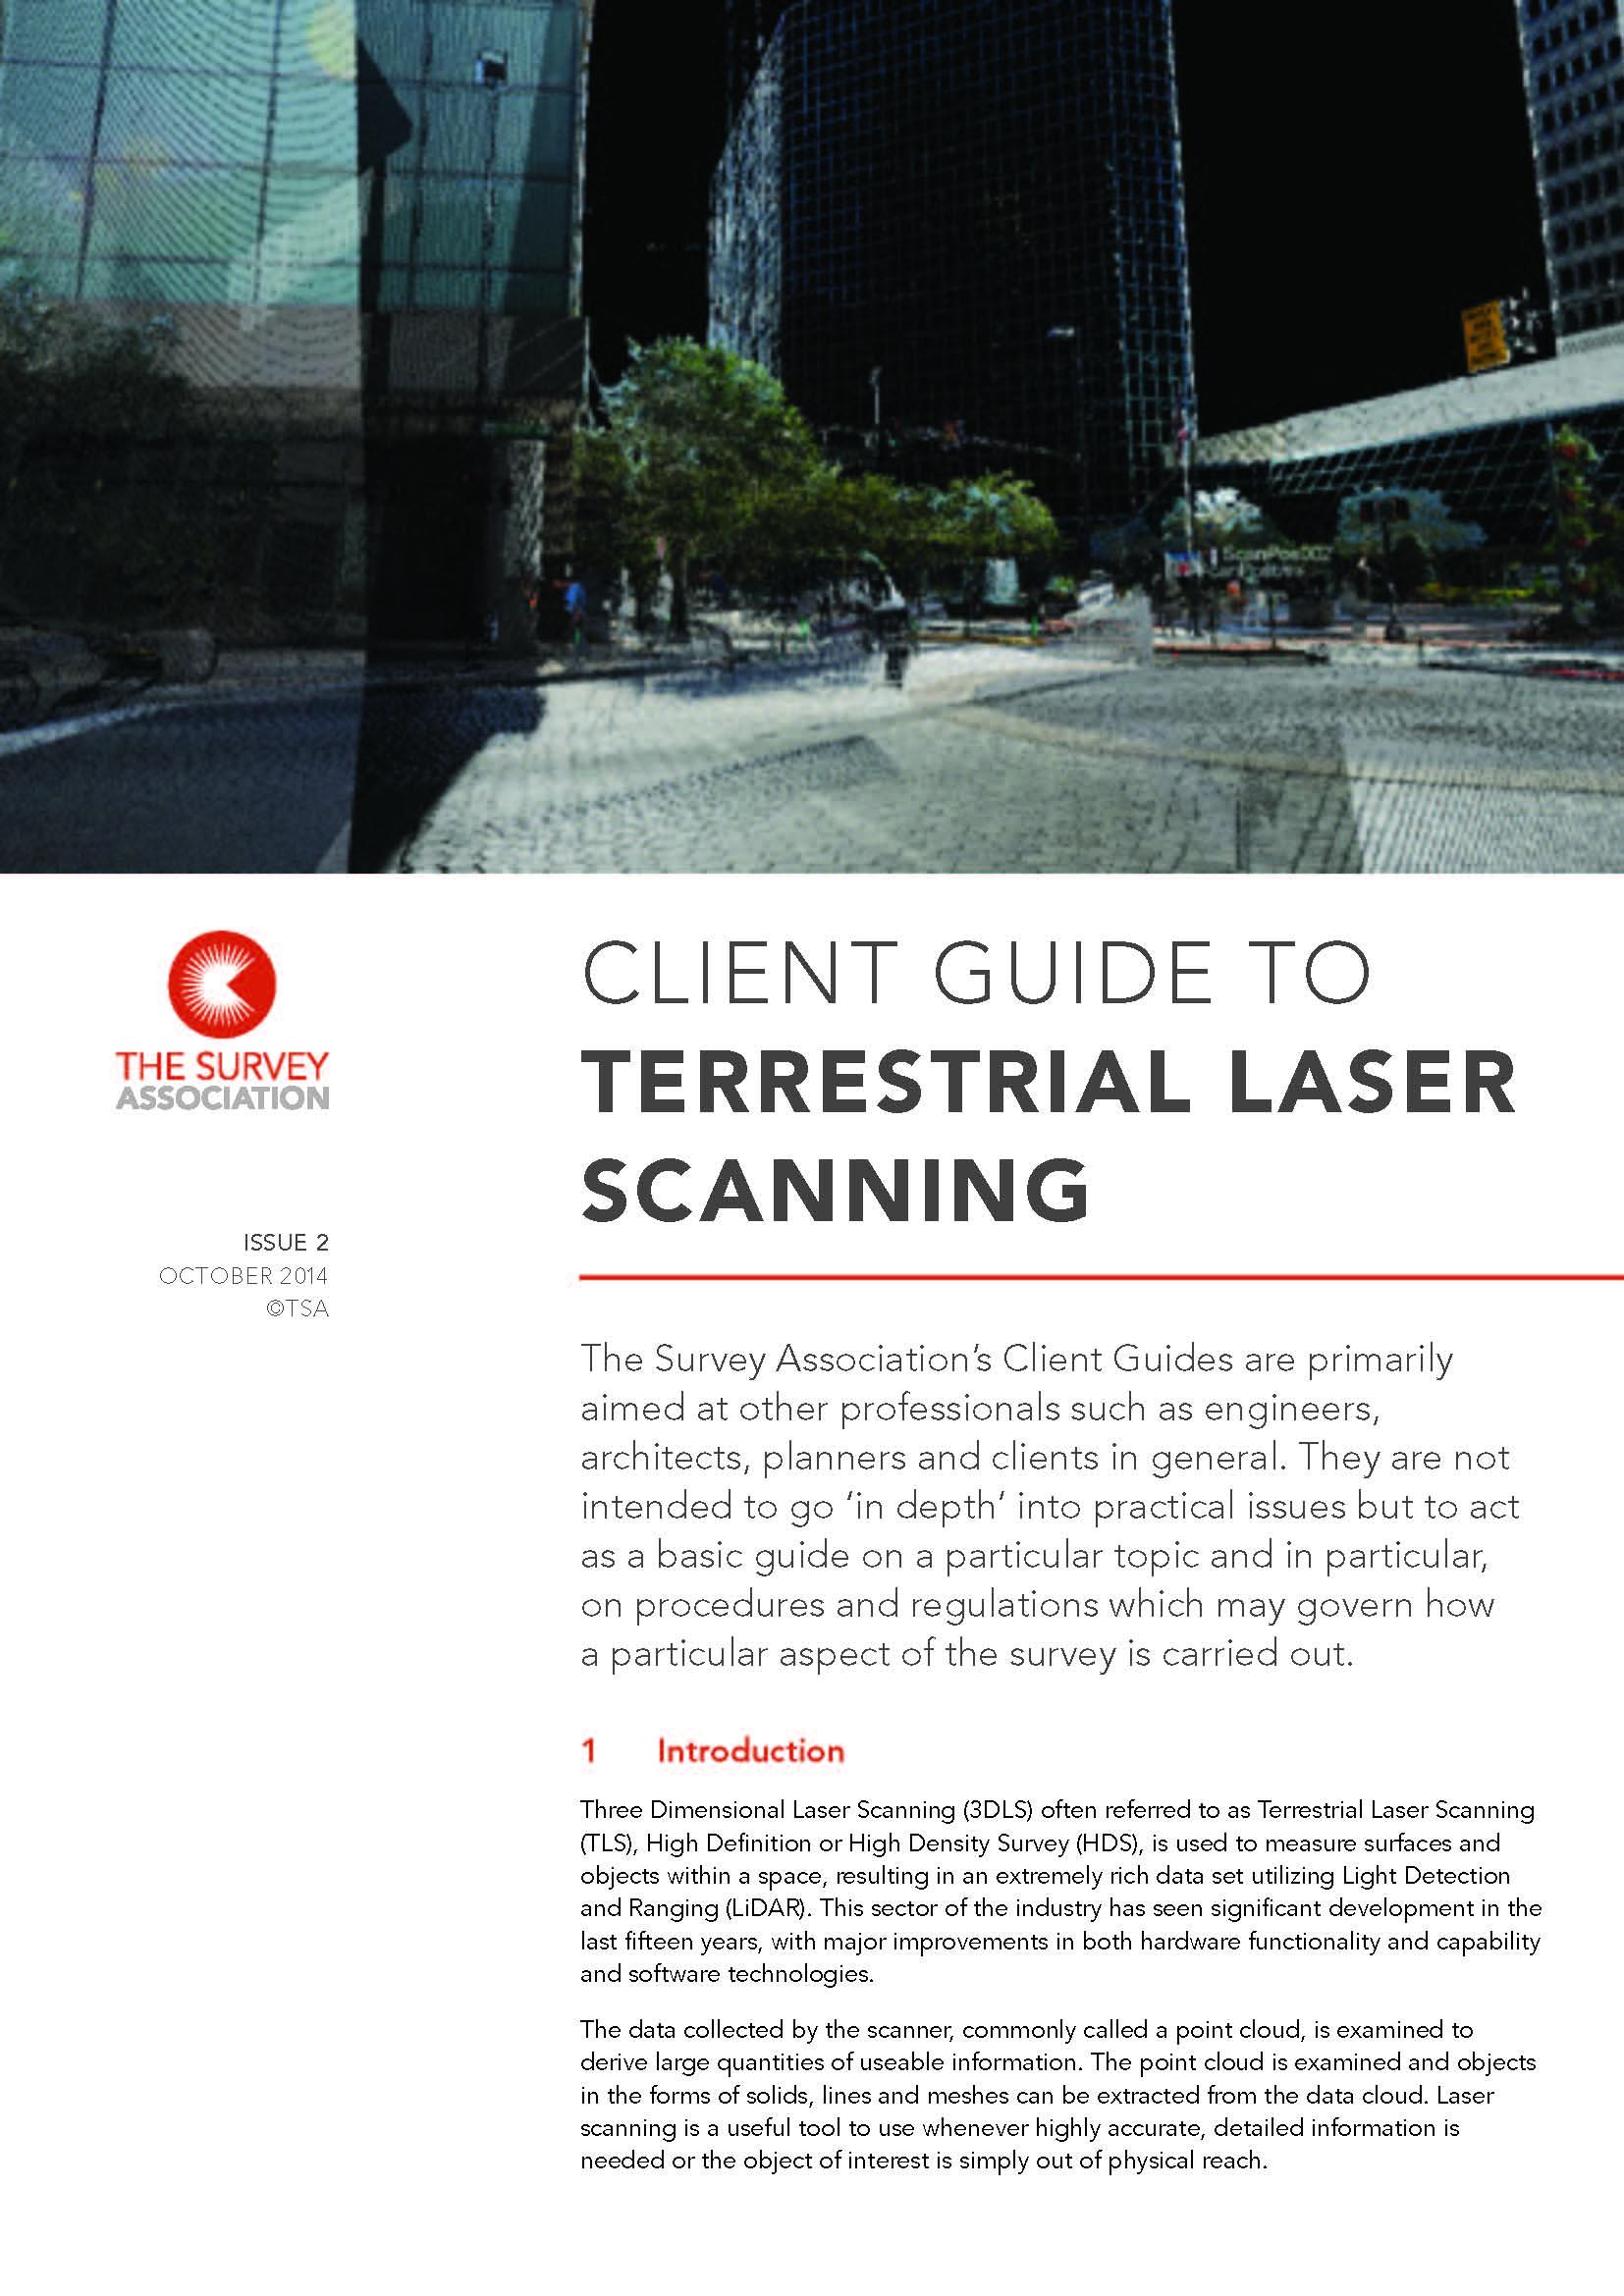 Revised TSA Client Guide on Terrestrial Laser Scanning